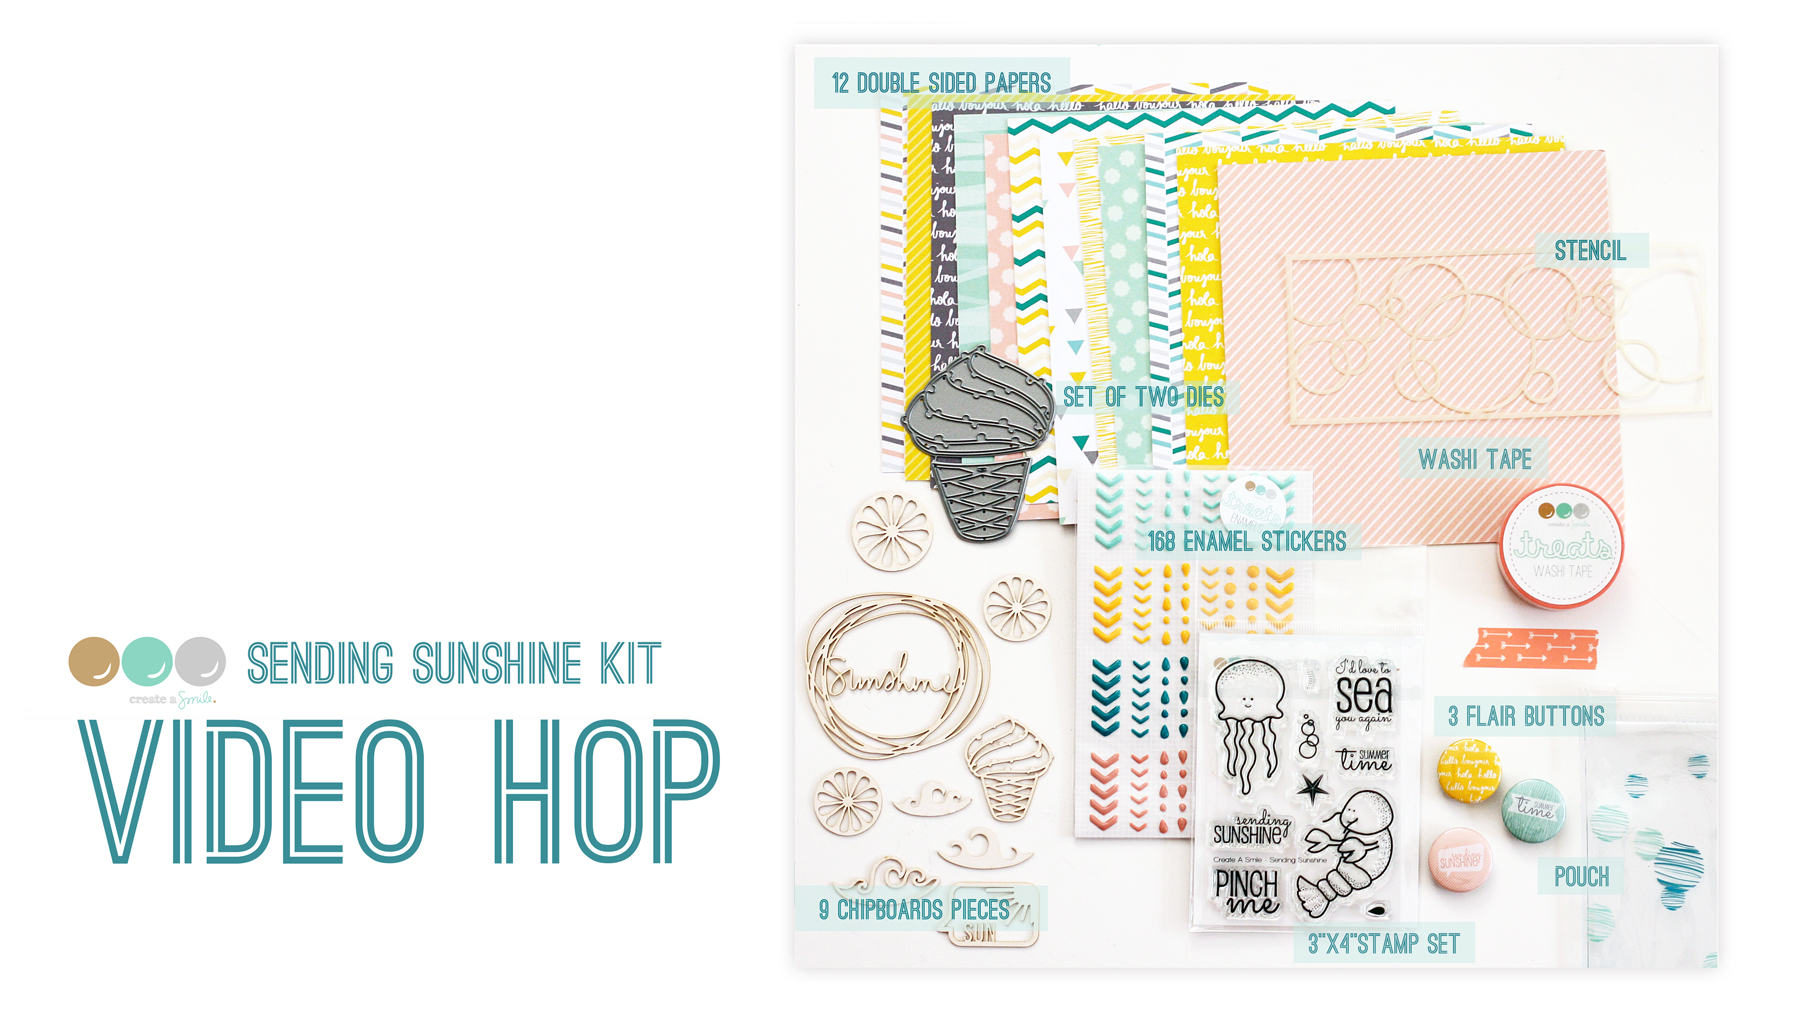 Sending Sunshine Kit - Video Hop Intro Graphic